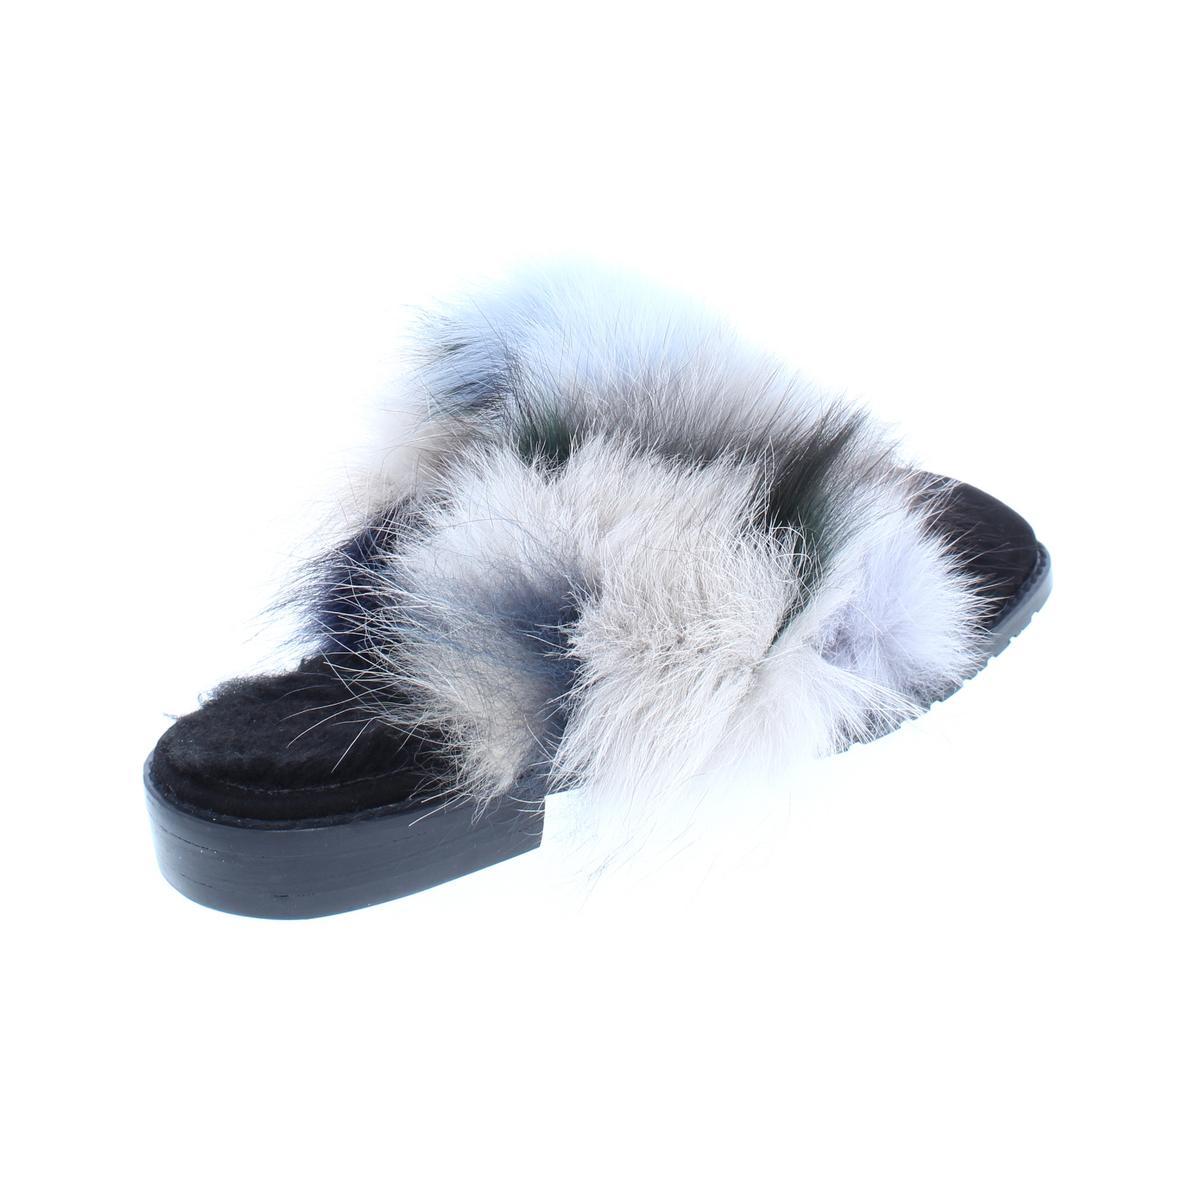 Stuart-Weitzman-Womens-Furgetit-Suede-Fox-Fur-Slide-Mules-Shoes-BHFO-8240 thumbnail 6